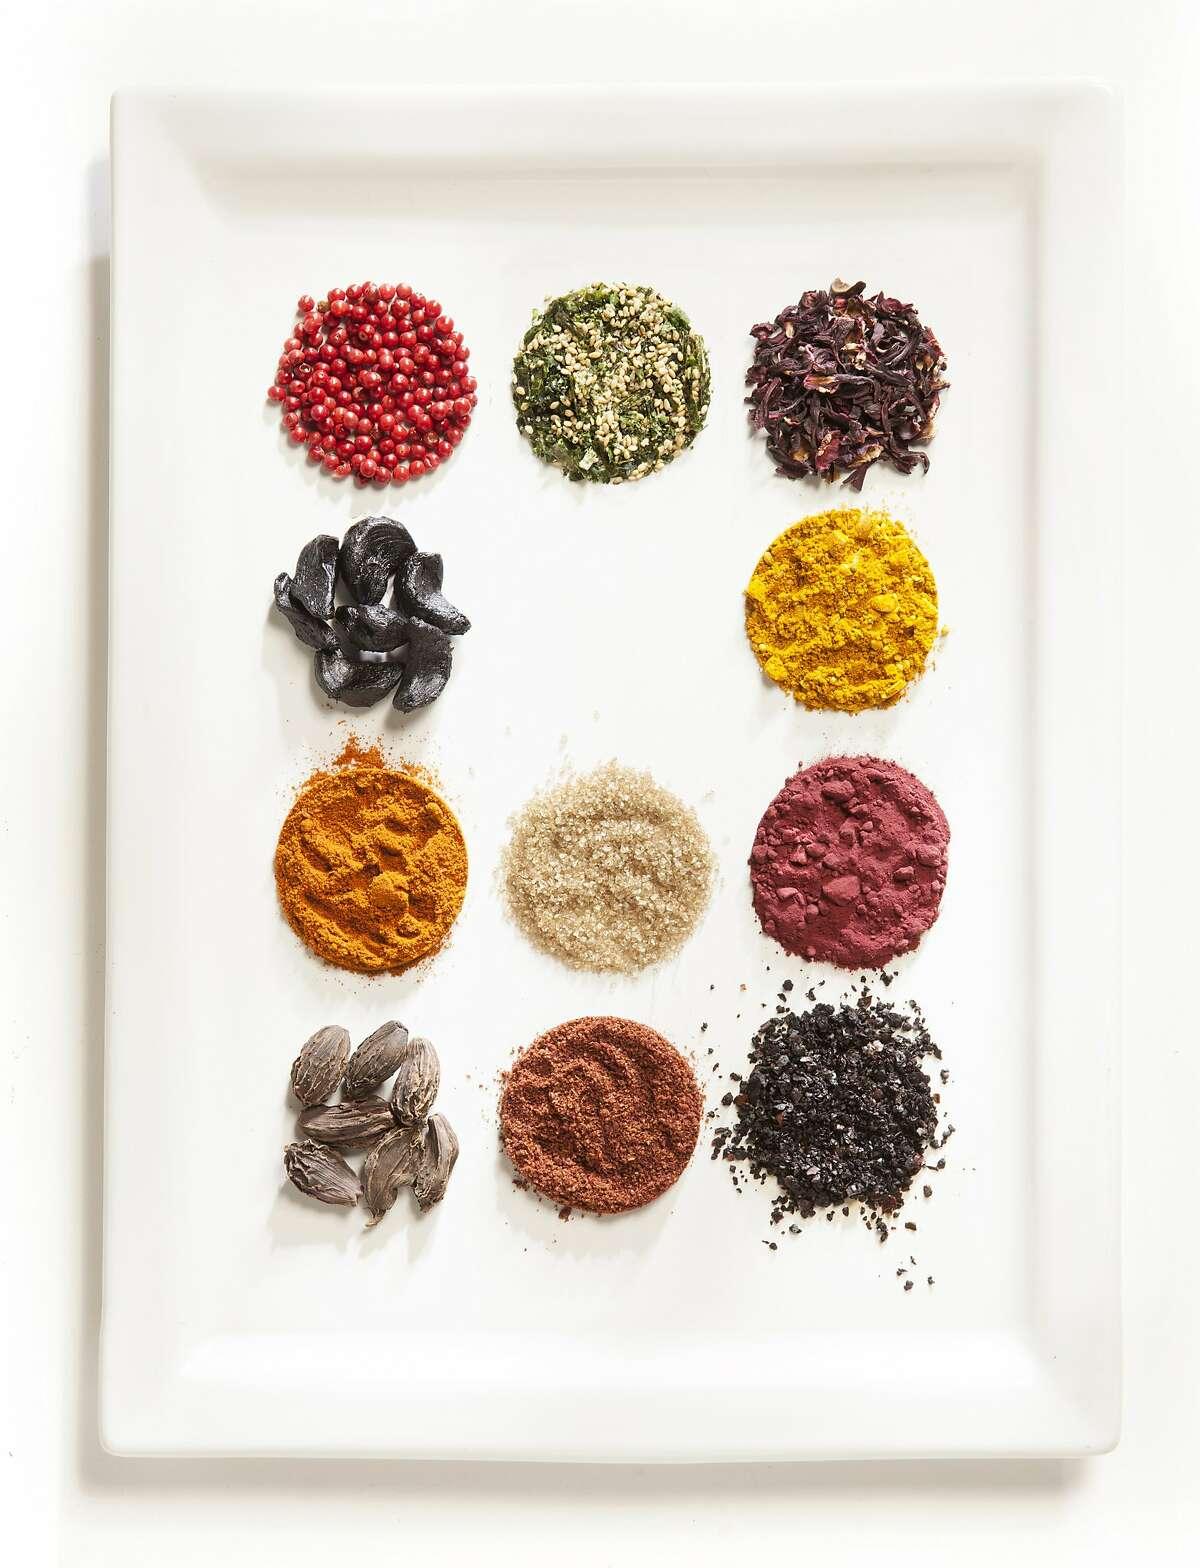 Spices, top row, from left: pink peppercorns, furikake, hibiscus flower. Second row: black garlic, vadouvan. Third row: Berbere, smoked salt, beet powder. Bottom row: black cardamom, sumac, Urfa biber